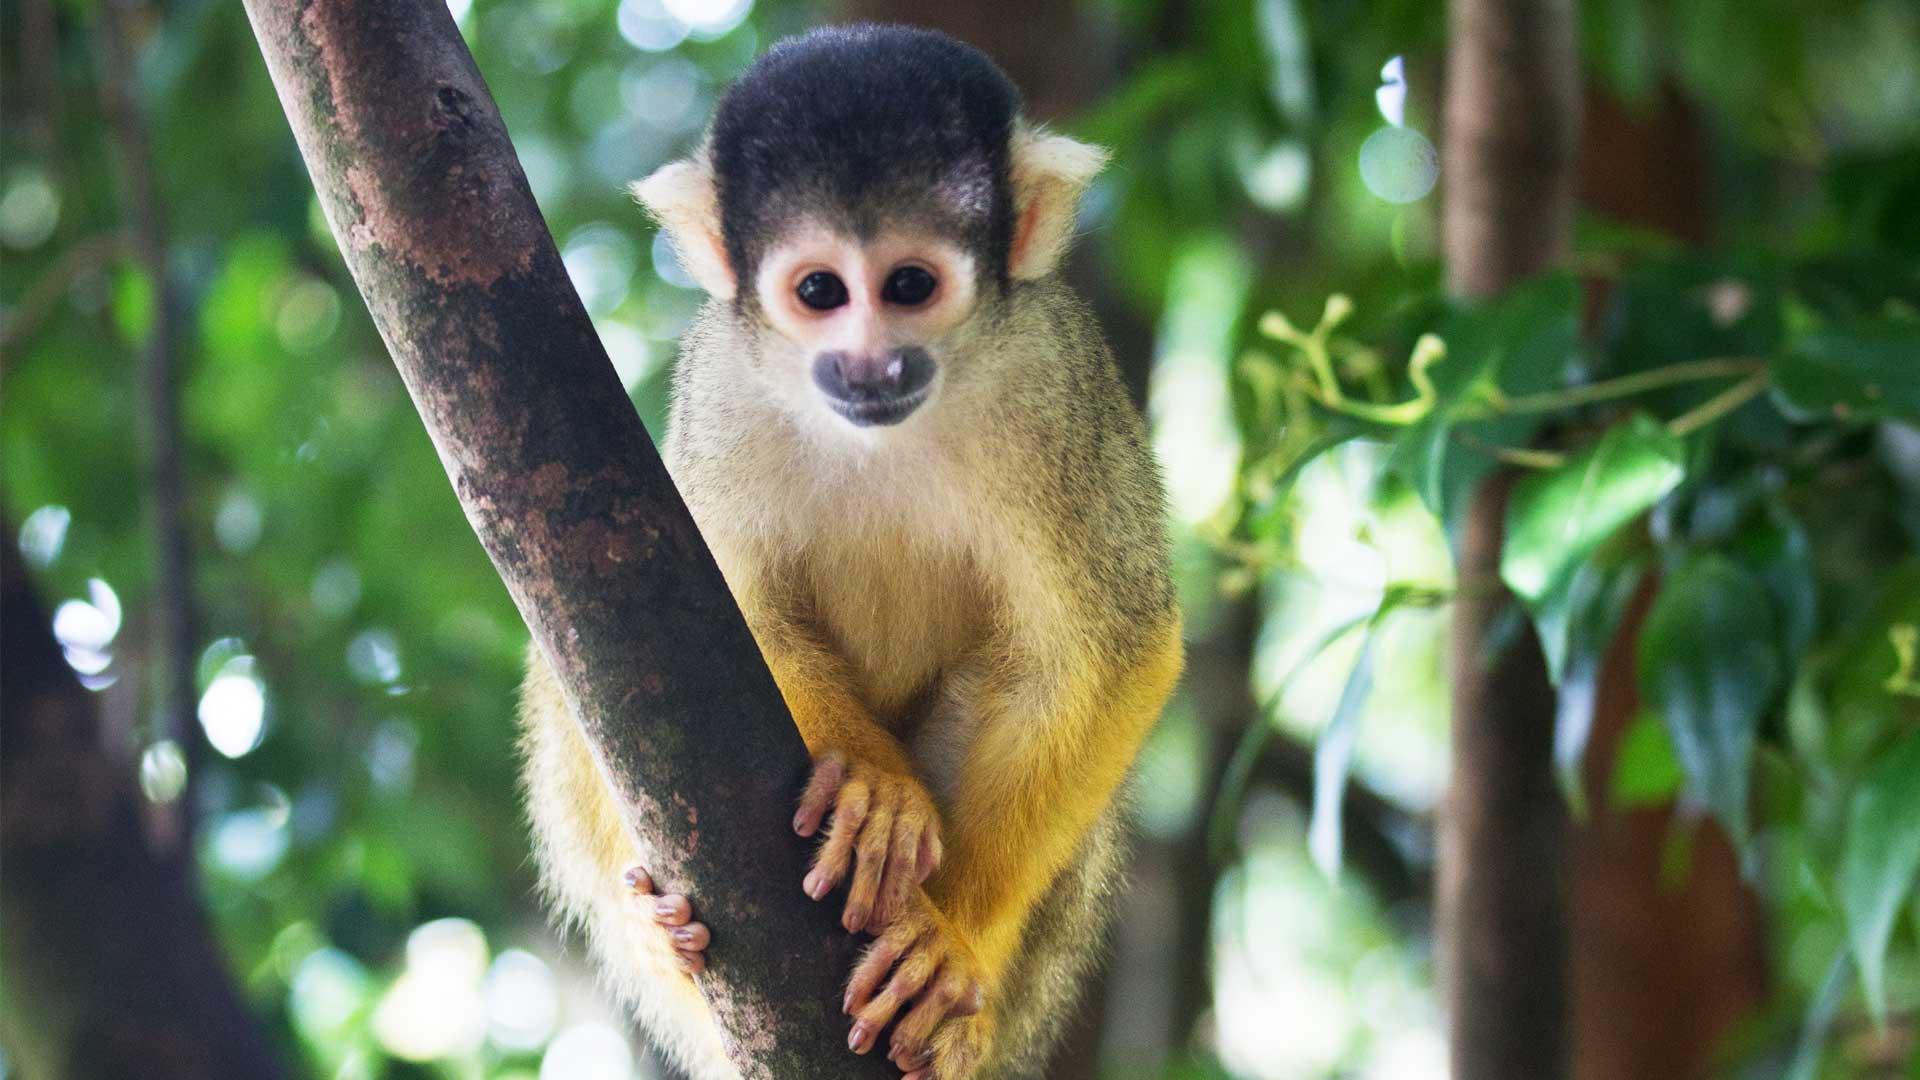 https://rfacdn.nz/zoo/assets/media/squirrel-monkey-gallery-1.jpg